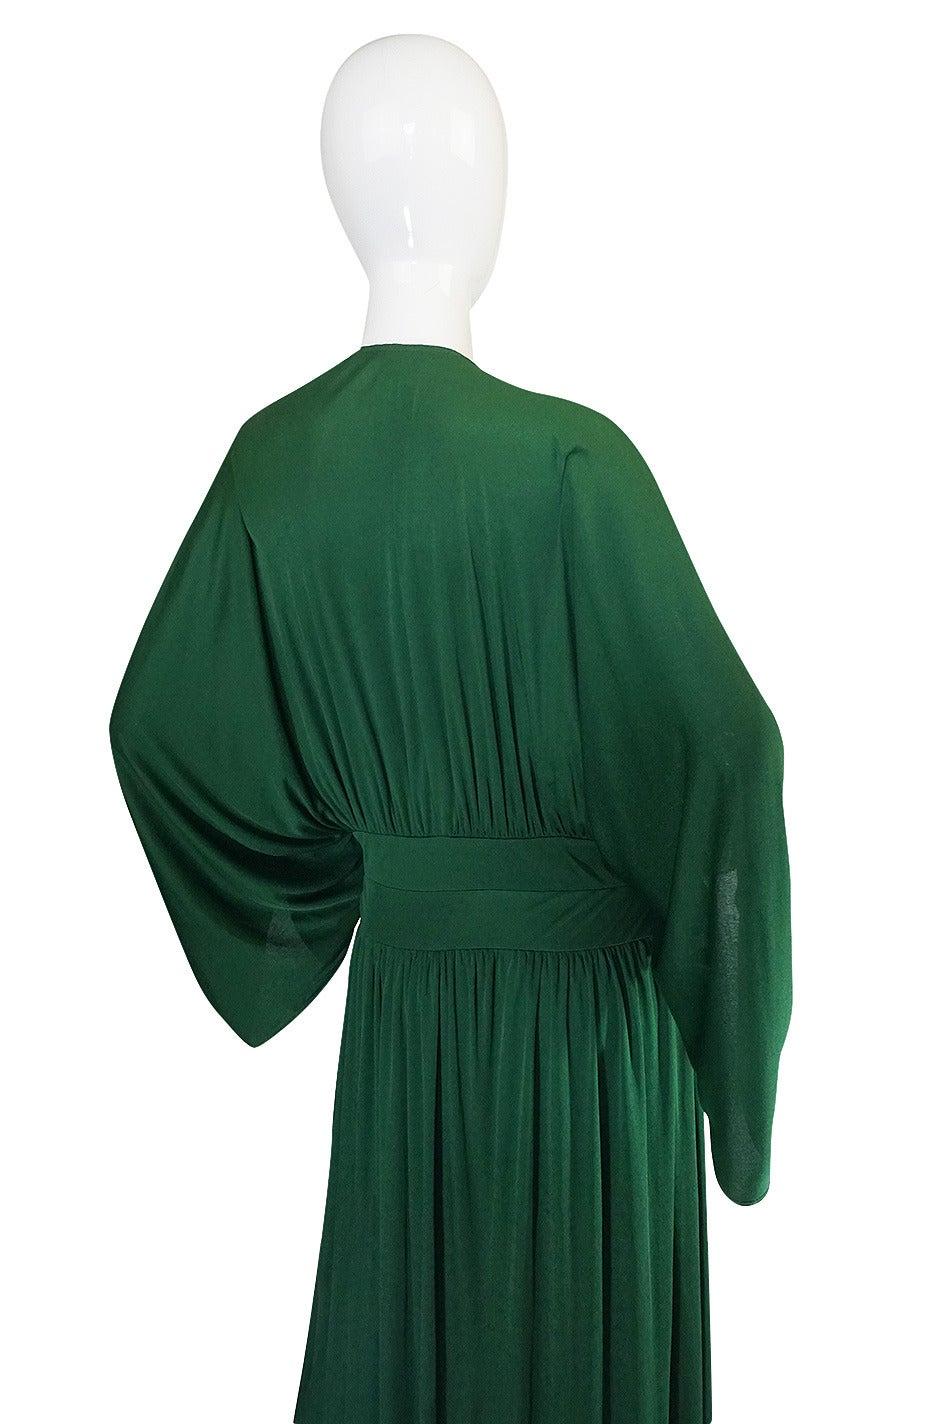 1960s Jean Patou Demi-Couture Green Jersey Caftan Dress 5